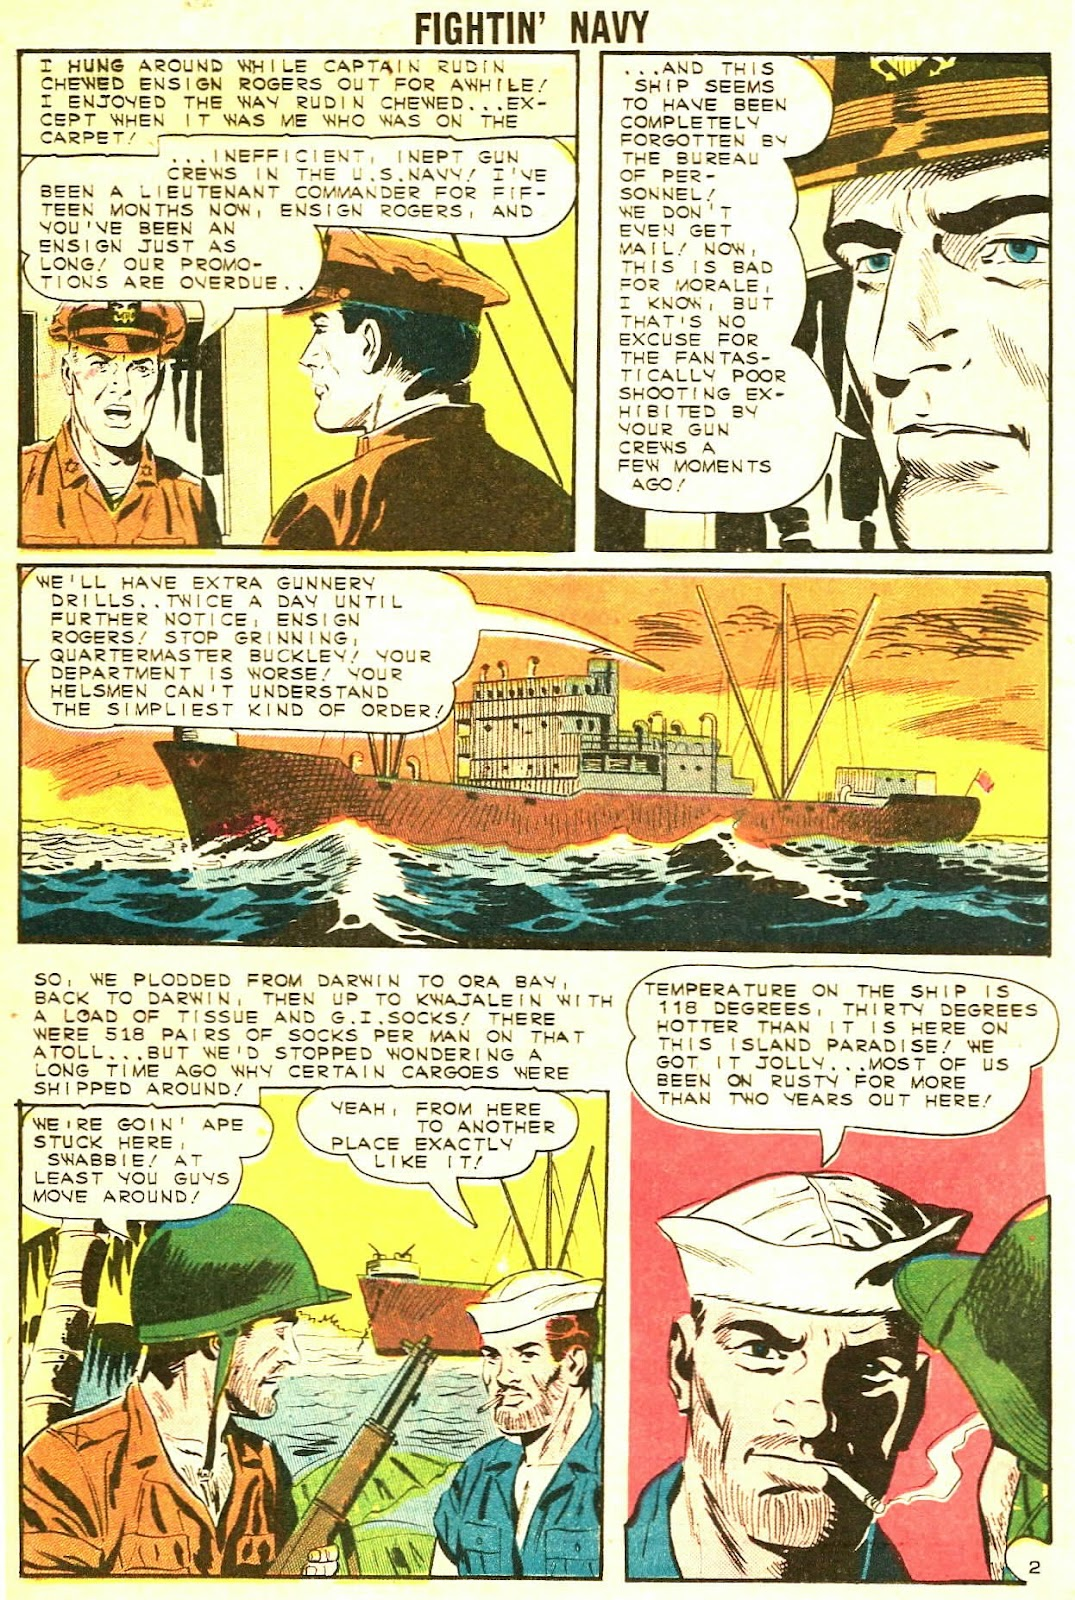 Read online Fightin' Navy comic -  Issue #117 - 16